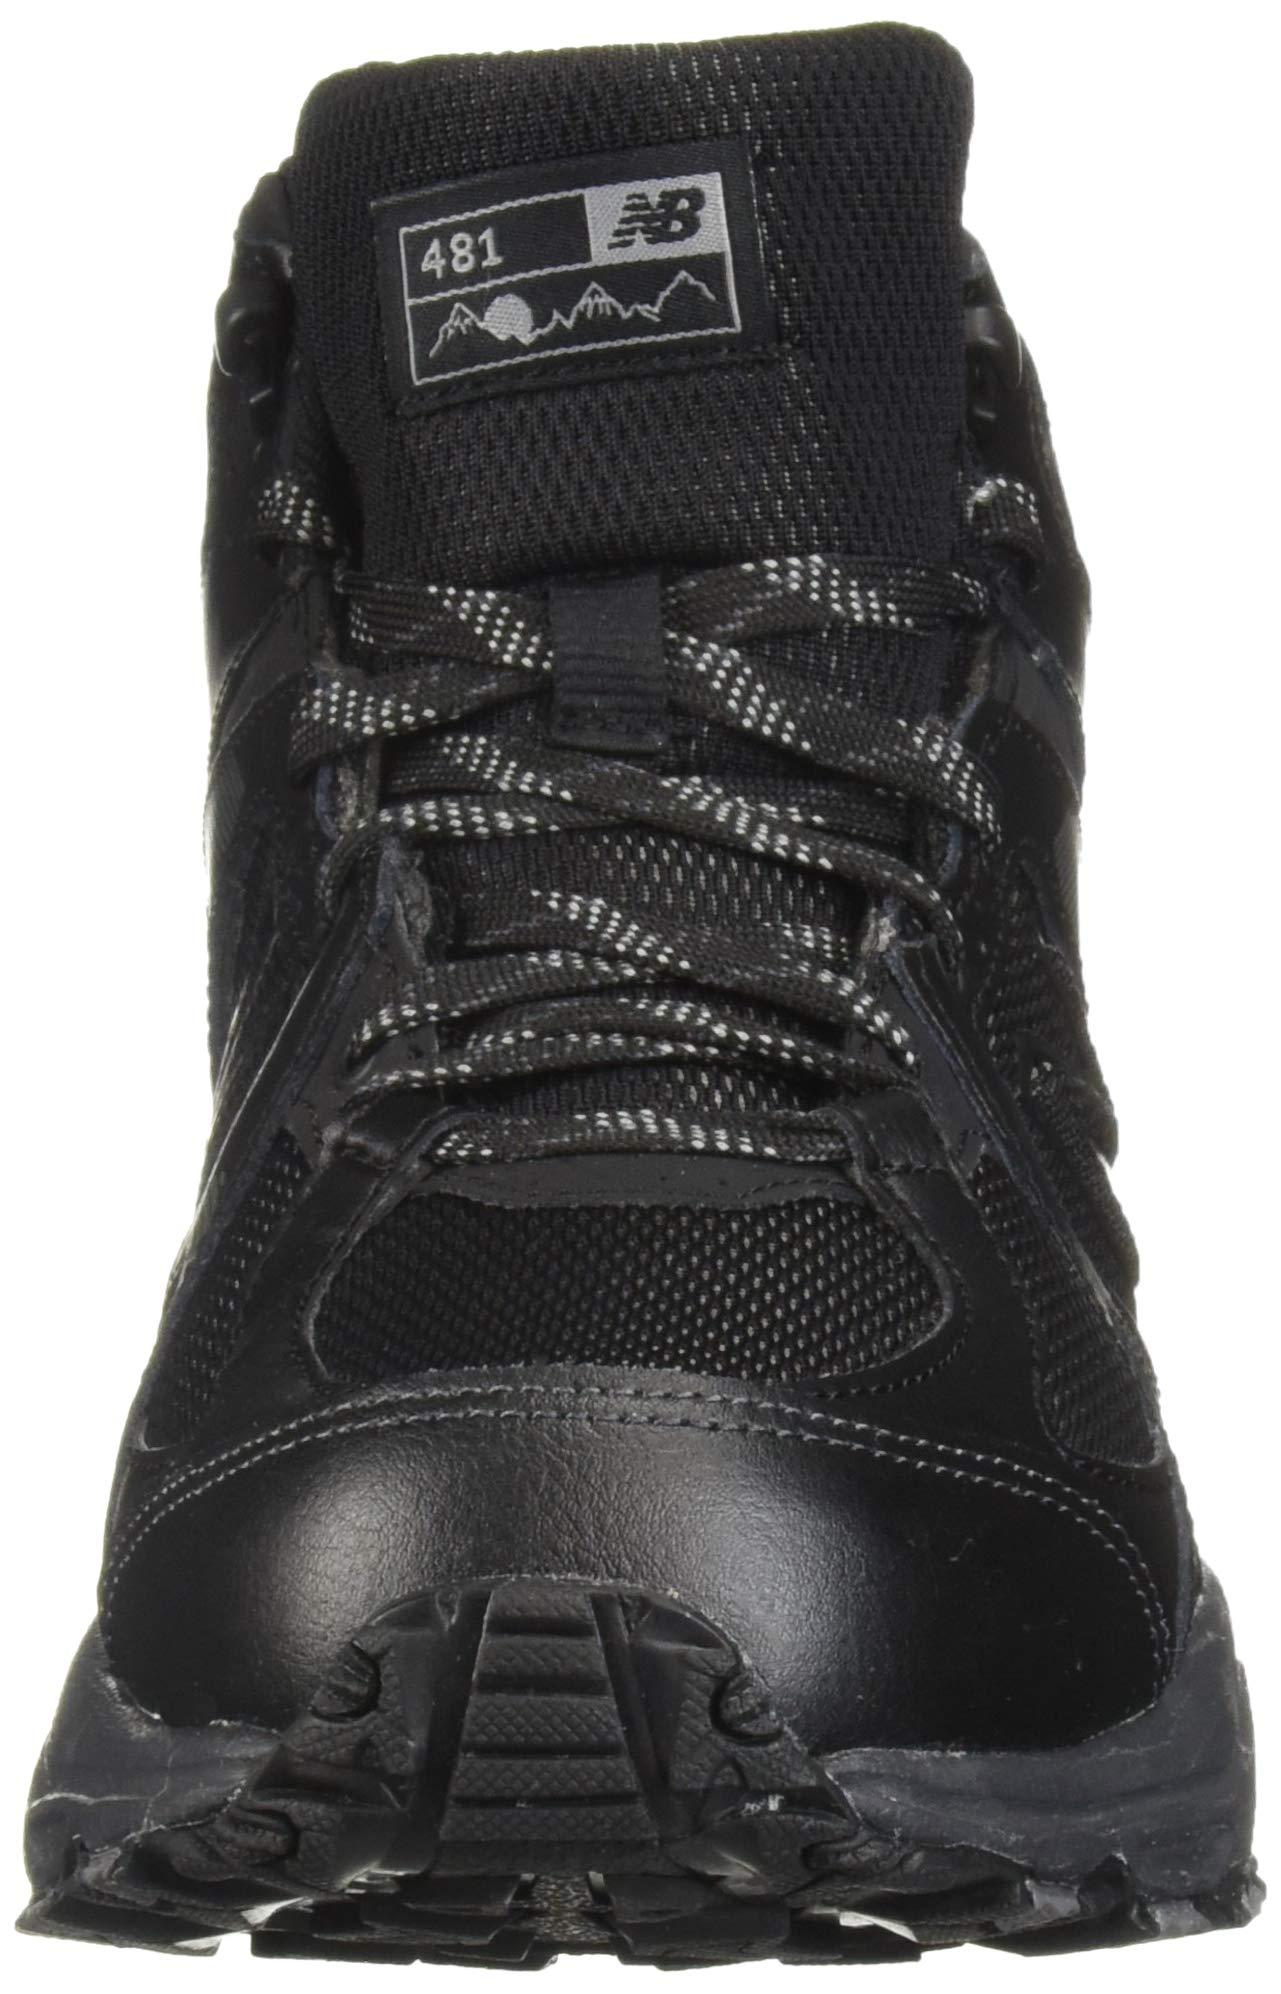 New Balance Men's 481 V3 Cushioning Trail Running Shoe Black/Magnet 9.5 D US by New Balance (Image #4)